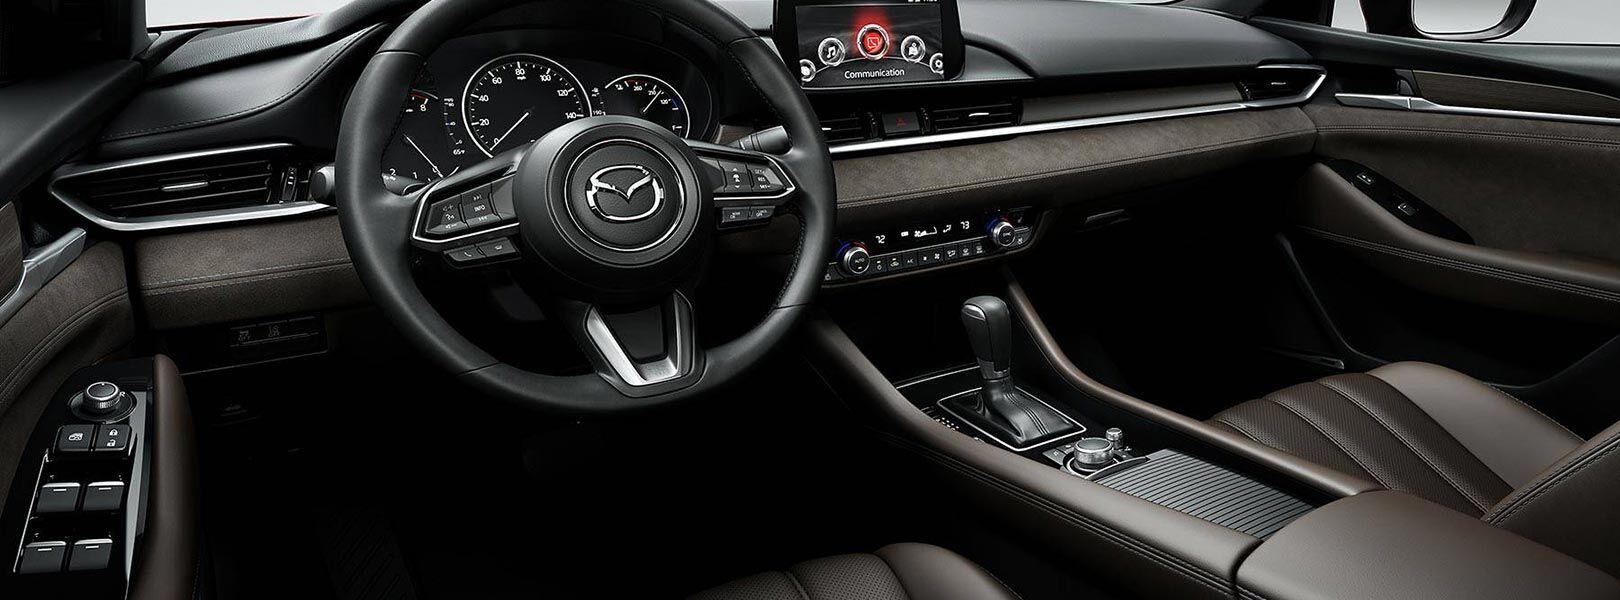 Cardinaleway Mazda Peoria >> 2018 Mazda 6 Turbocharged Sports Sedan – Mid Size Cars Peoria AZ